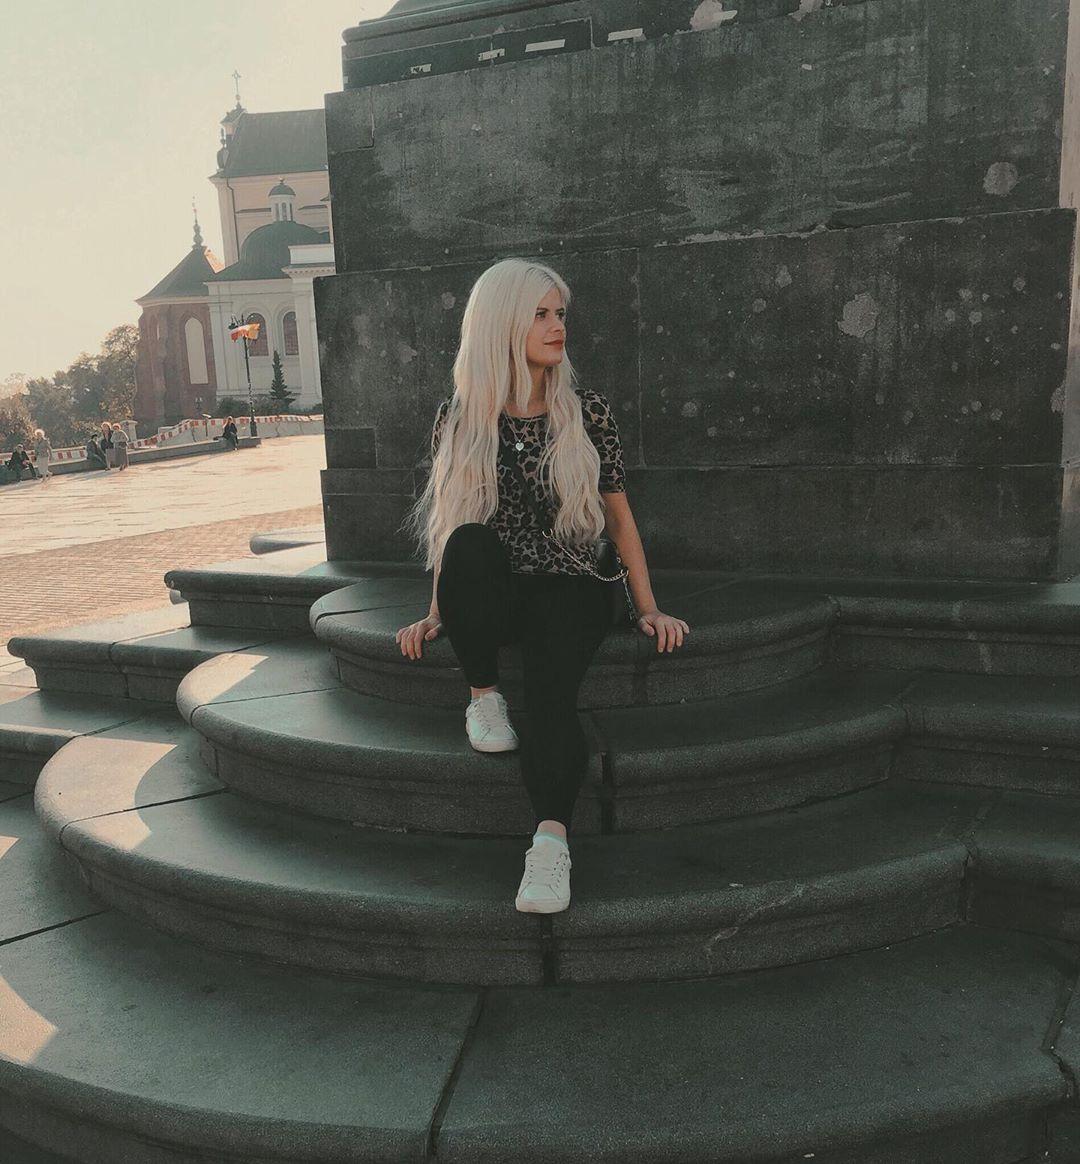 🧜🏼♀️ #goodmorning #pose #poland #sunnyday #me #sun #light #happy #blondegirl #blonde #longhair #hai...